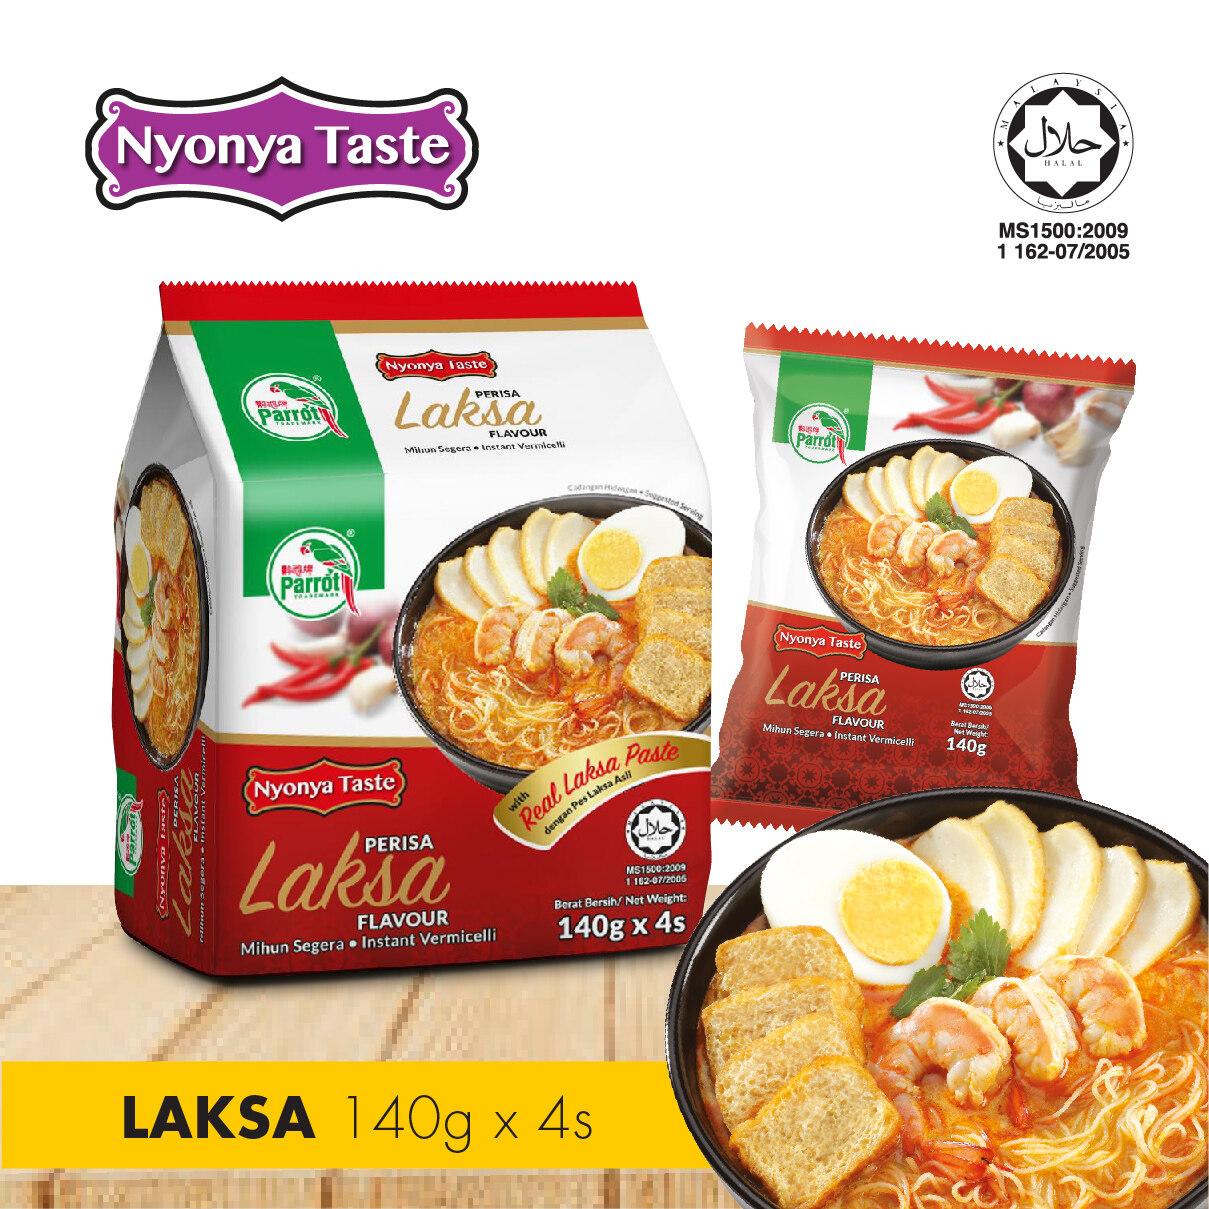 [Free Shipping] Bundle A Instant Vermicelli Nyonya Tomyam / Laksa 140g x 24 Pkg (1 carton)